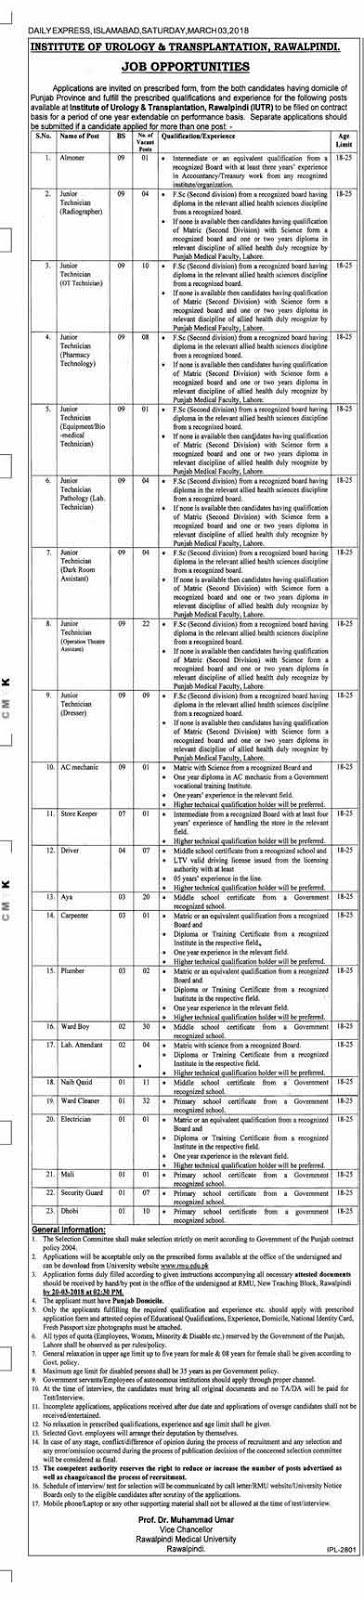 Institute of Urology & Transplantation Jobs in Rawalpindi 2018